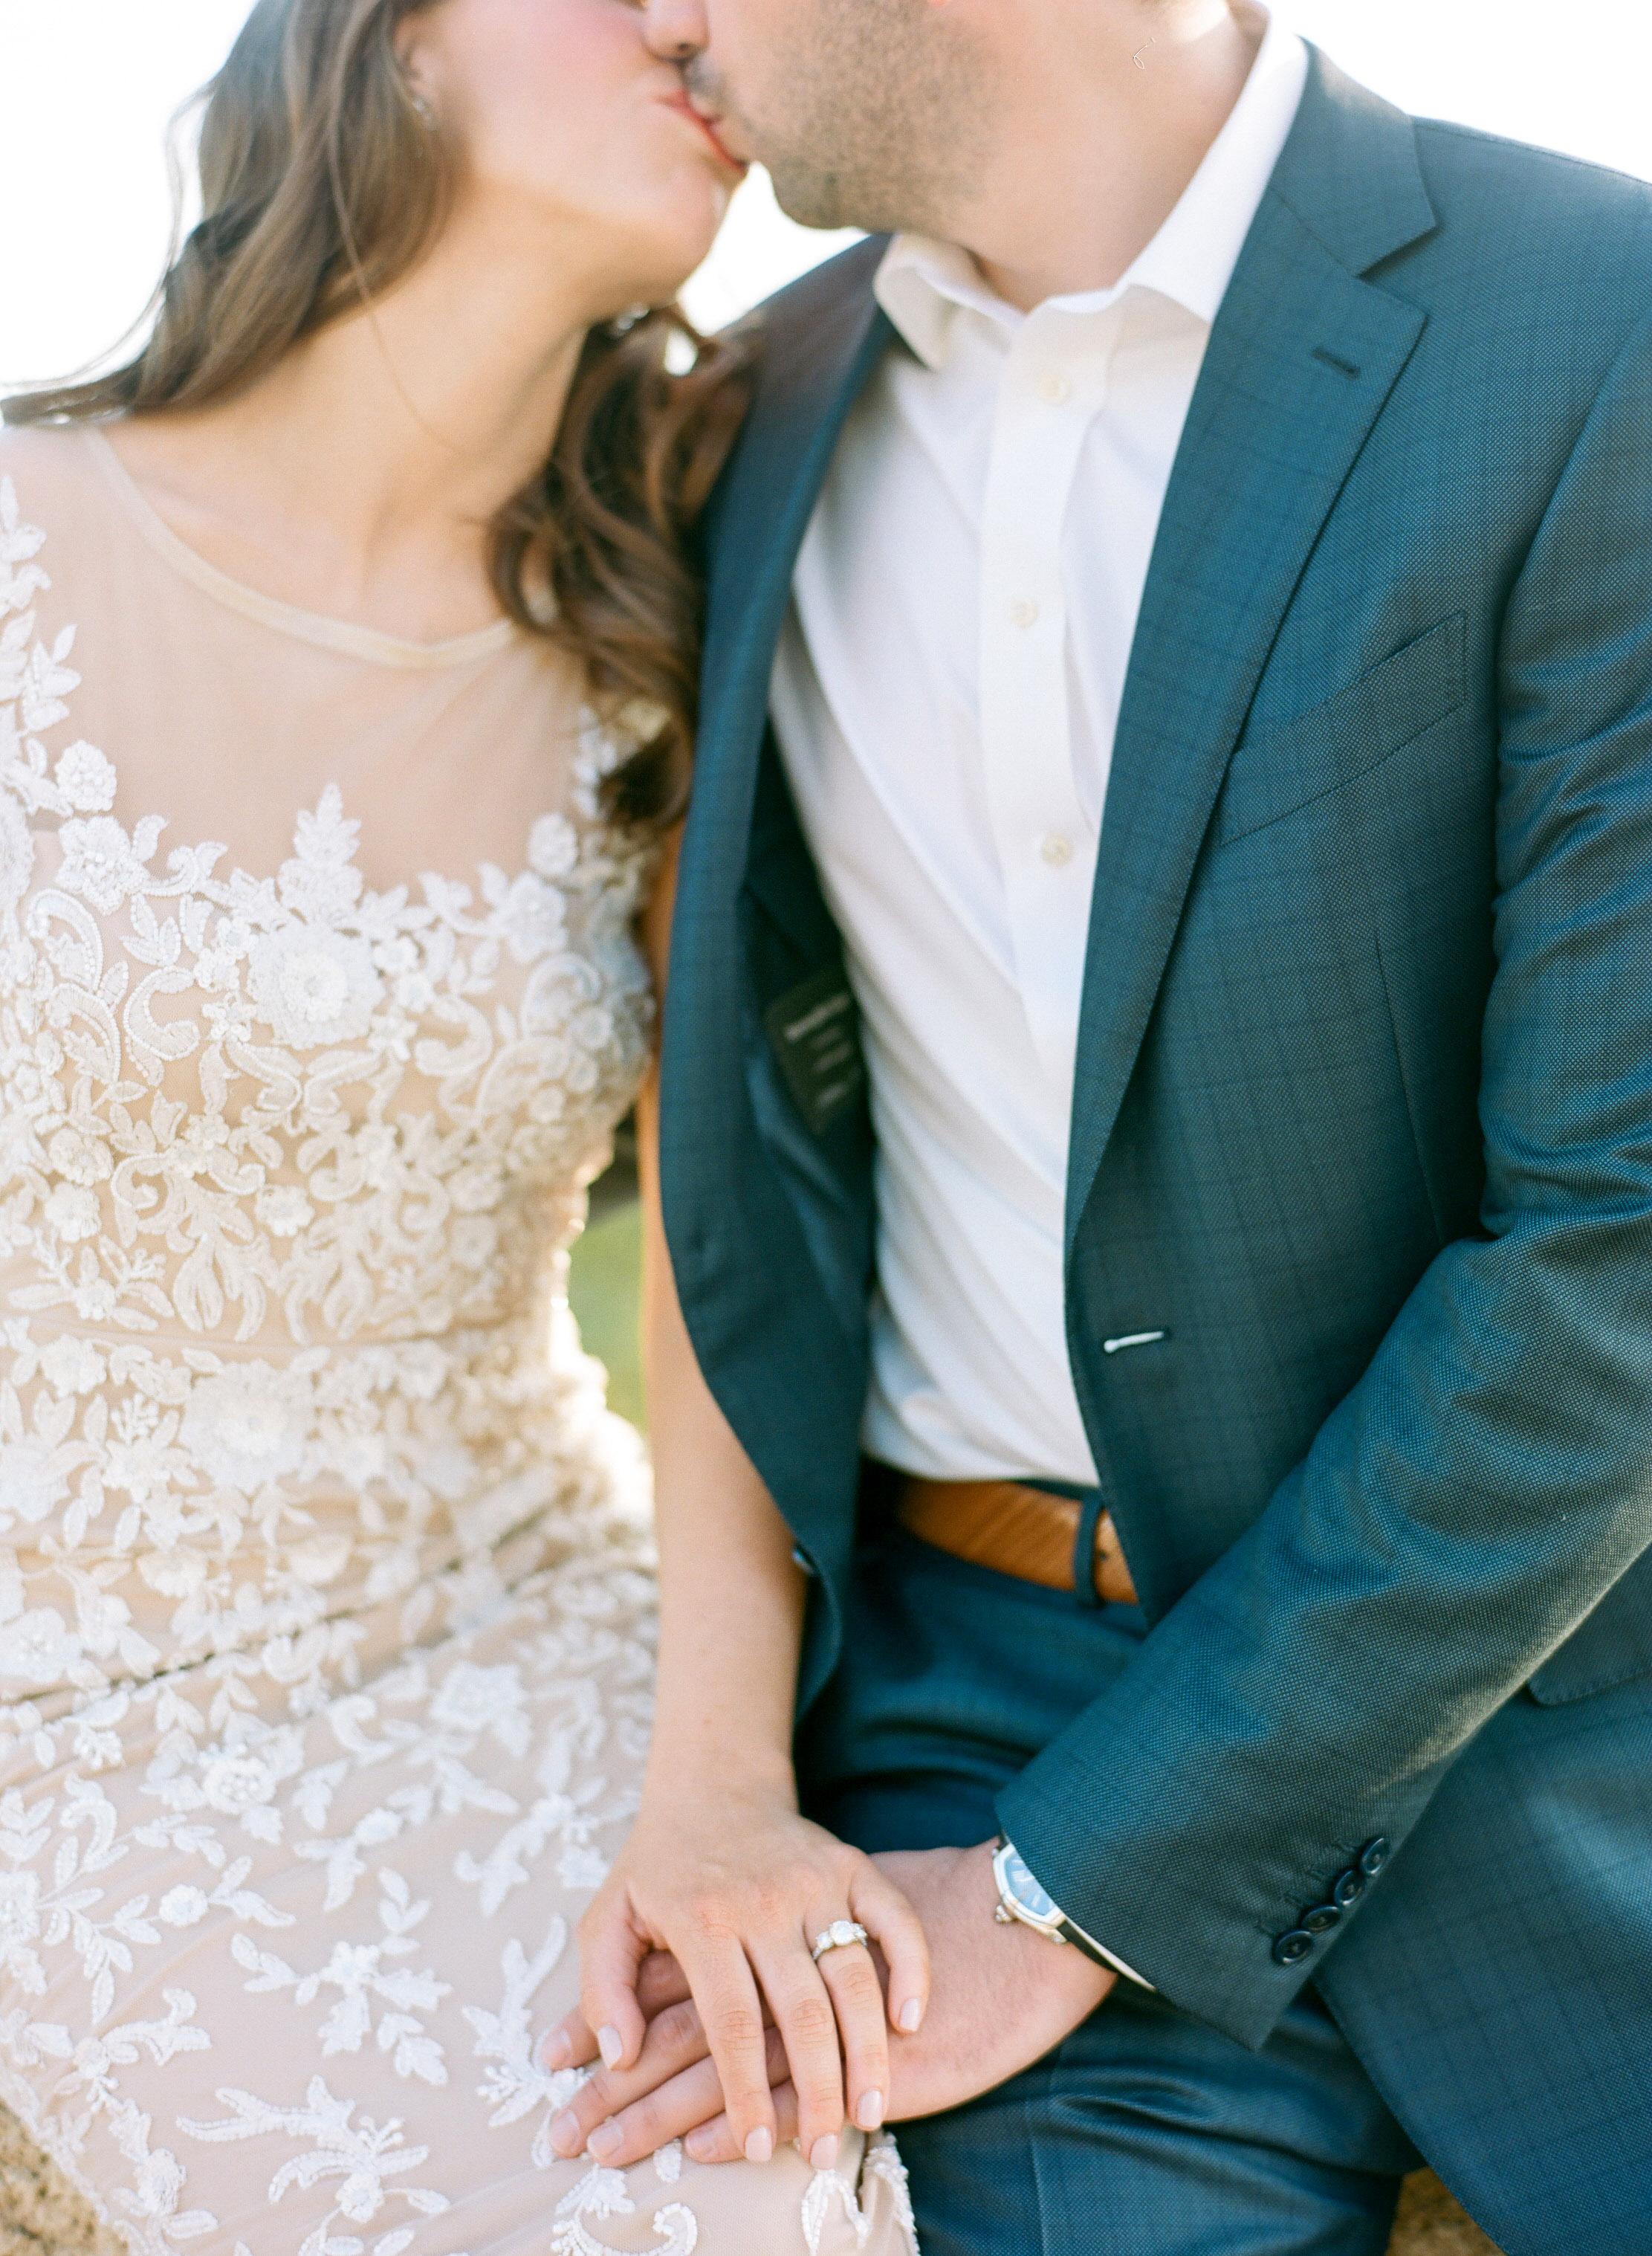 Dana-Fernandez-Photography-Destination-Wedding-Photographer-Cabo-San-Lucas-Film-Houston-Texas-Cabo-8.jpg